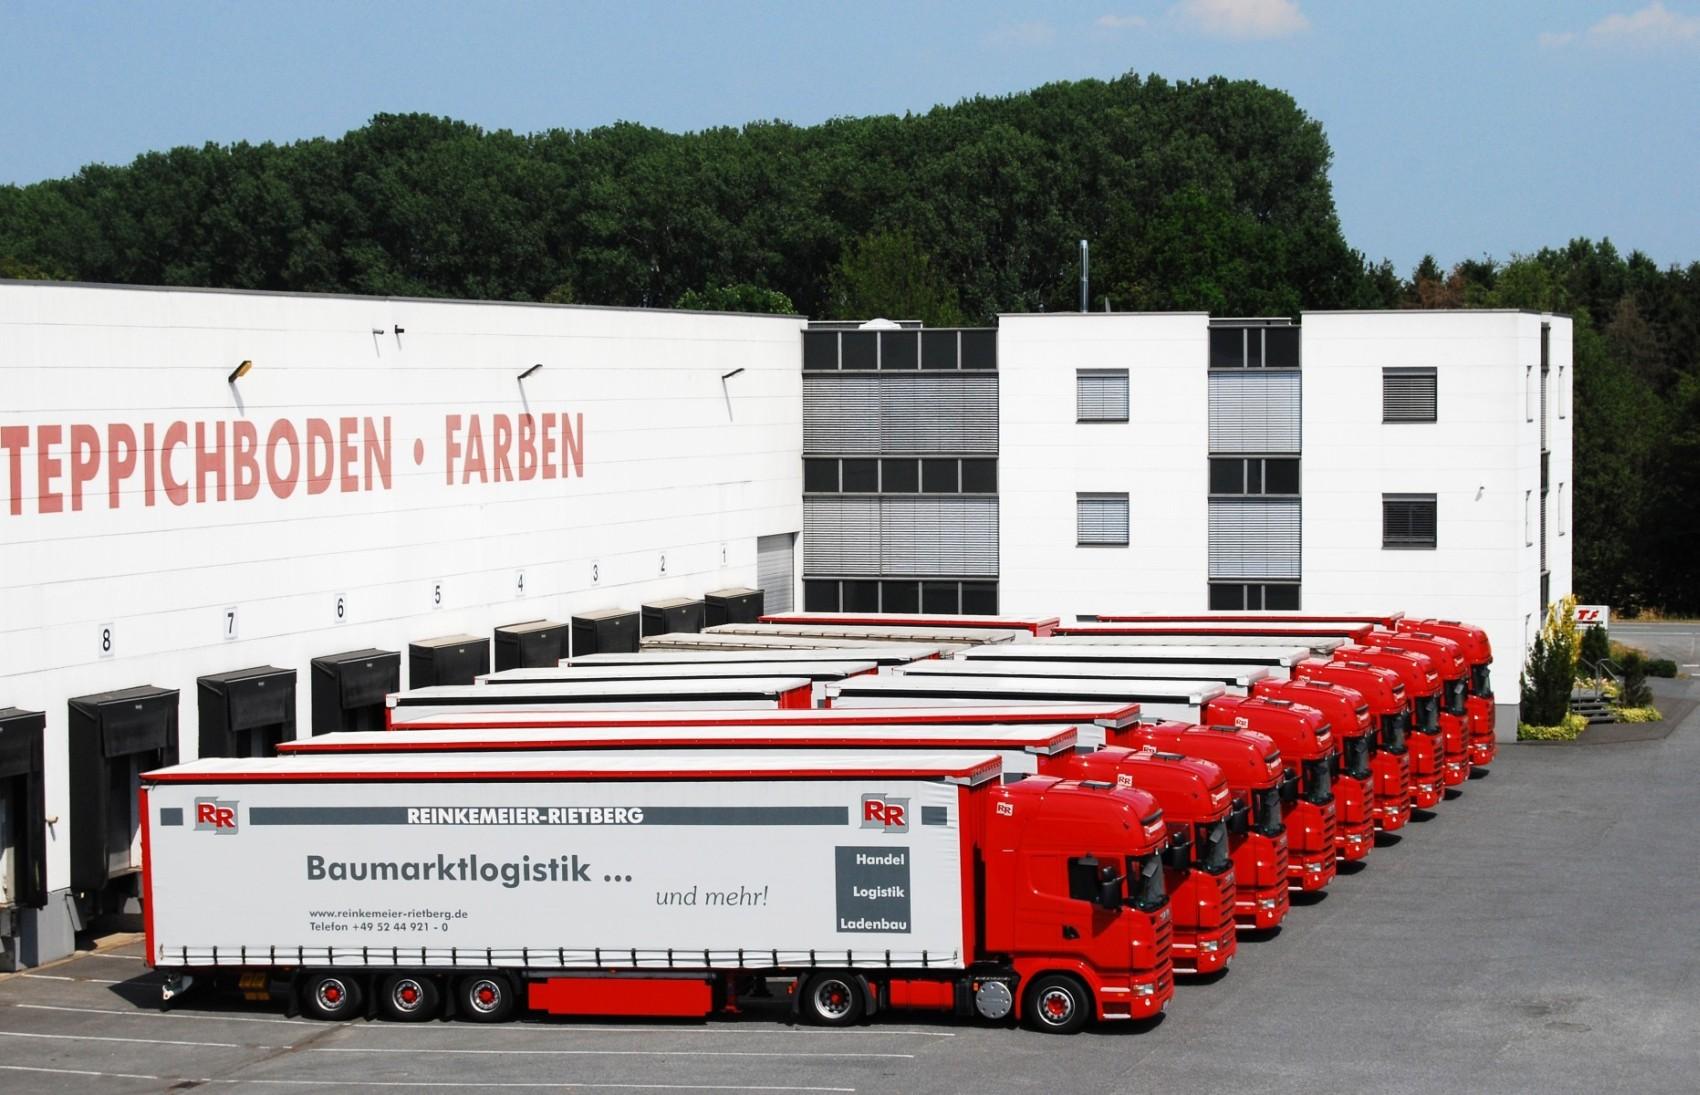 Baumarktlogistik reinkemeier rietberg handel logistik ladenbau - Reinkemeier rietberg ...